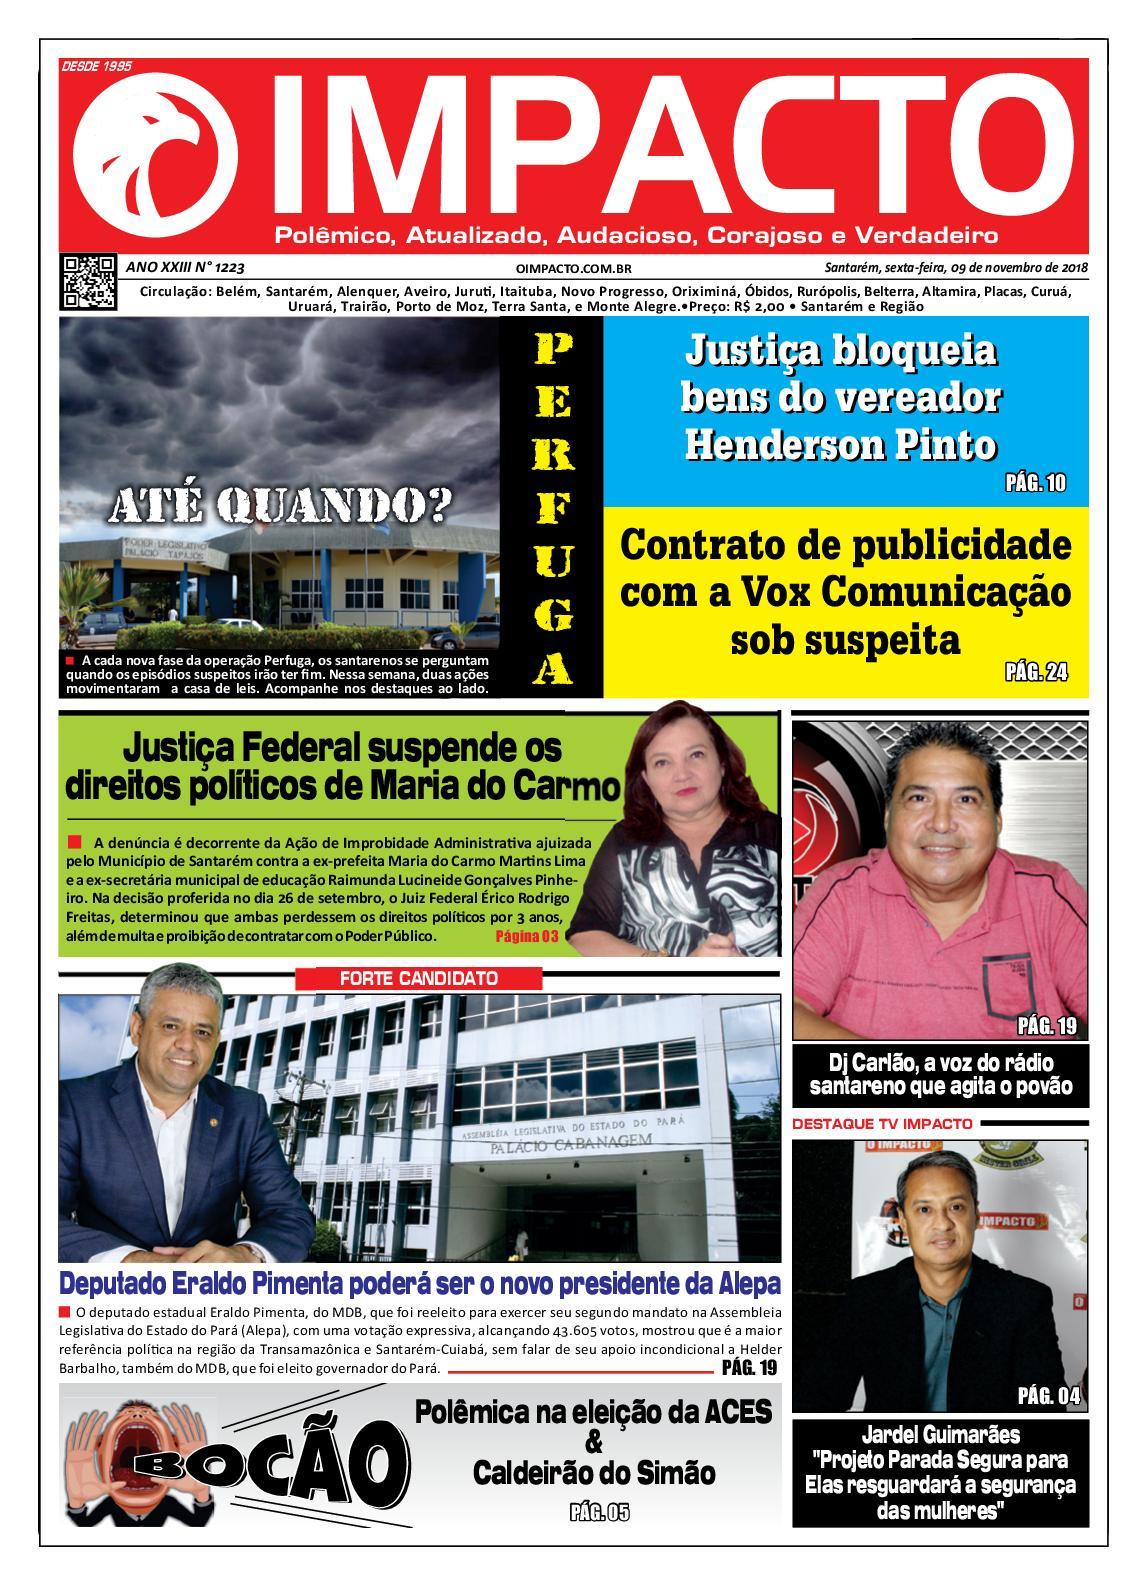 Calaméo - Jornal O Impacto Ed. 1223 5b996a9642f45